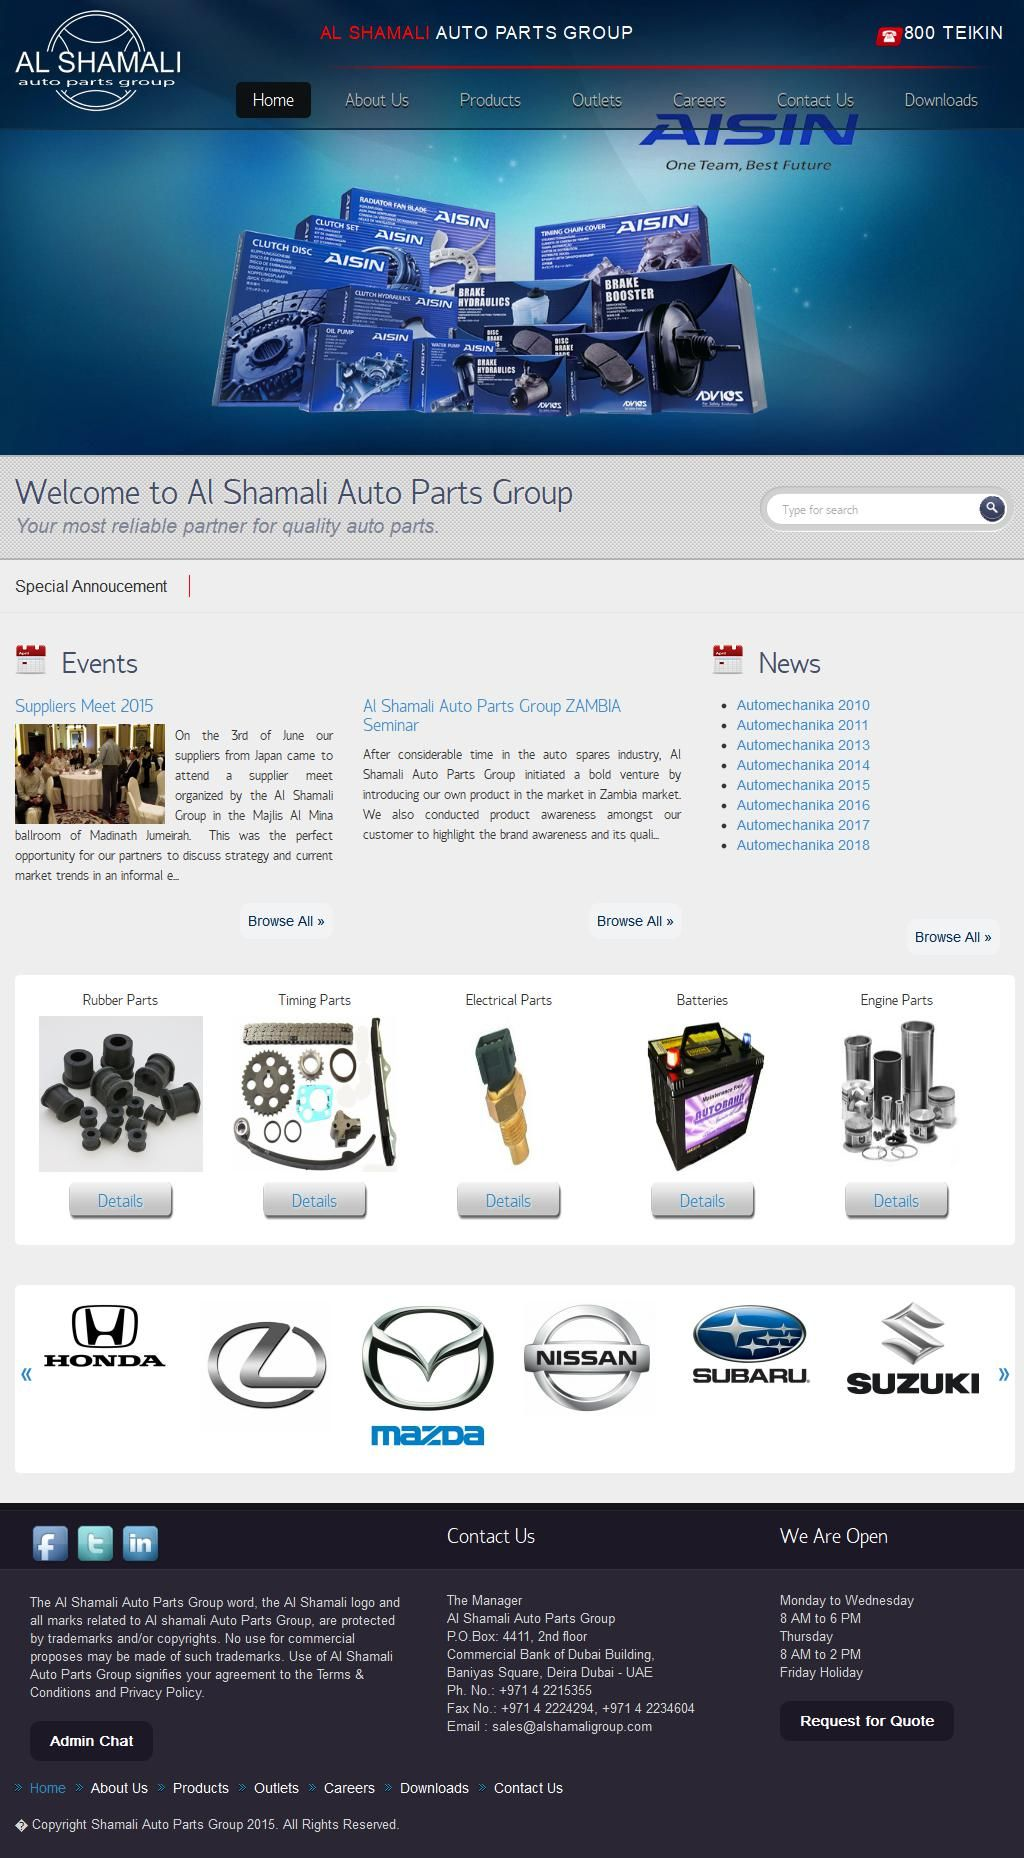 Century Spare Parts Trading Company, Llc 34, Al Borj